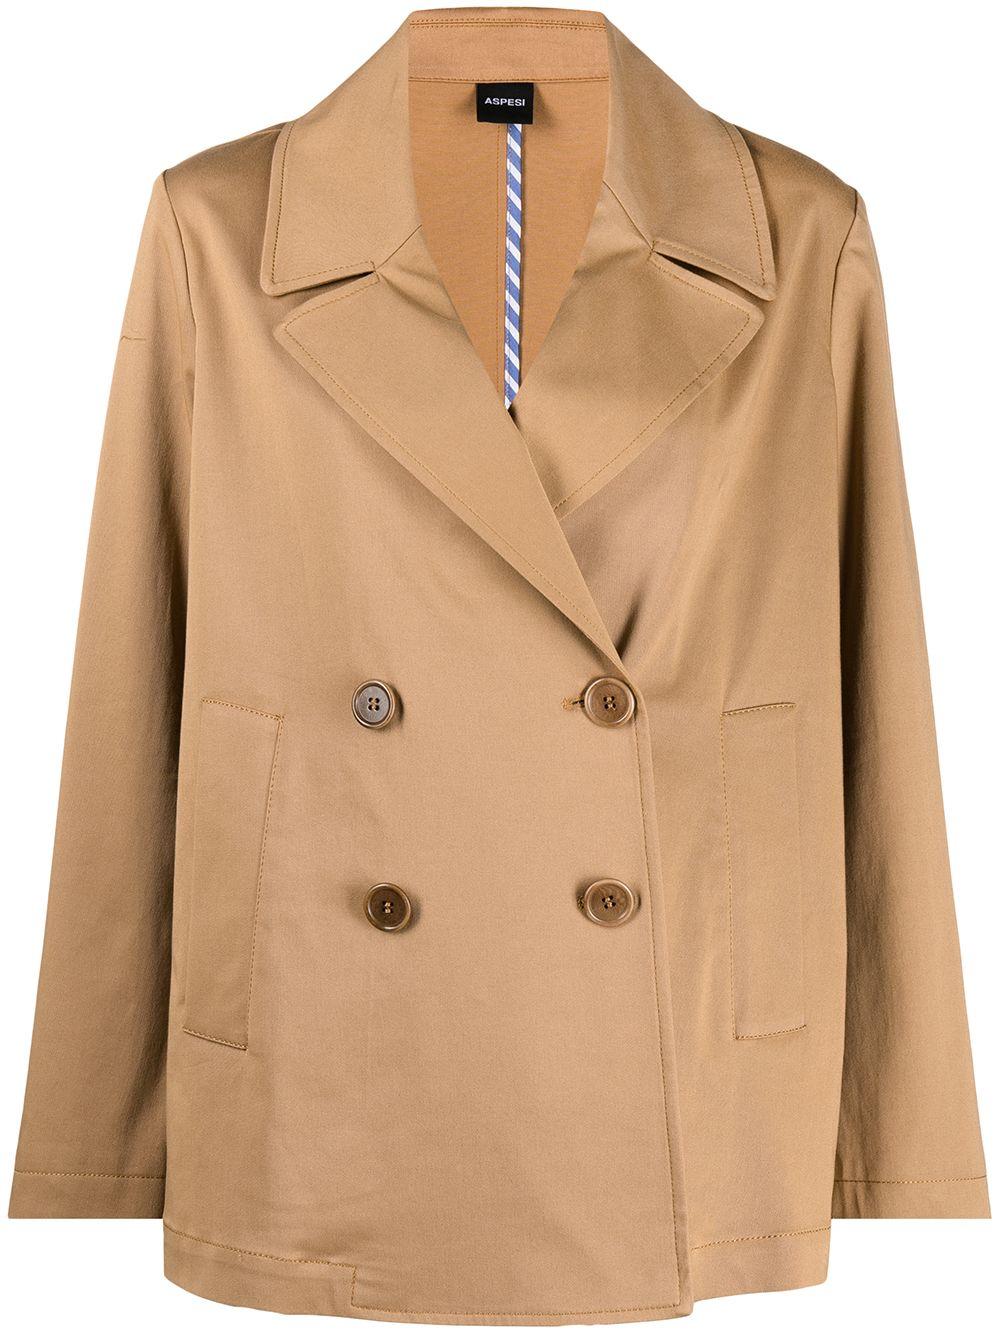 Camel cotton double-breasted blazer  ASPESI |  | WJ06-G41701372